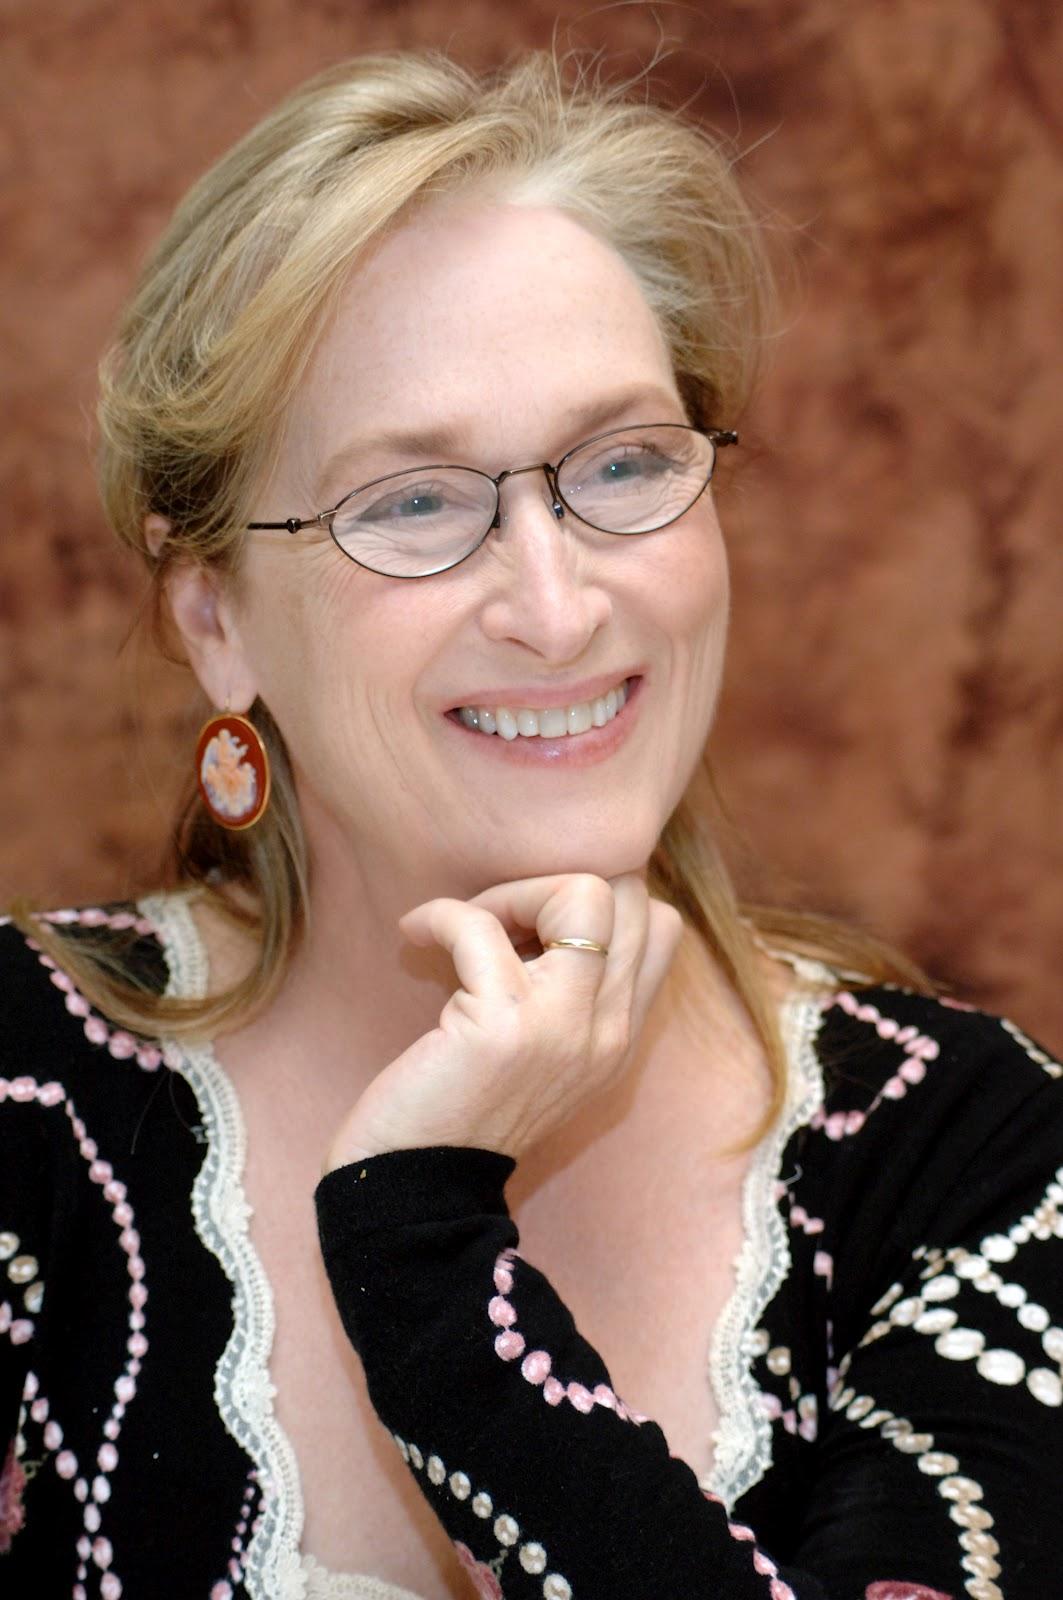 http://1.bp.blogspot.com/--uUrLXJfAco/T6V6f2nEW3I/AAAAAAAAEWY/-EIv-vkNpnY/s1600/Meryl+Streep.jpg